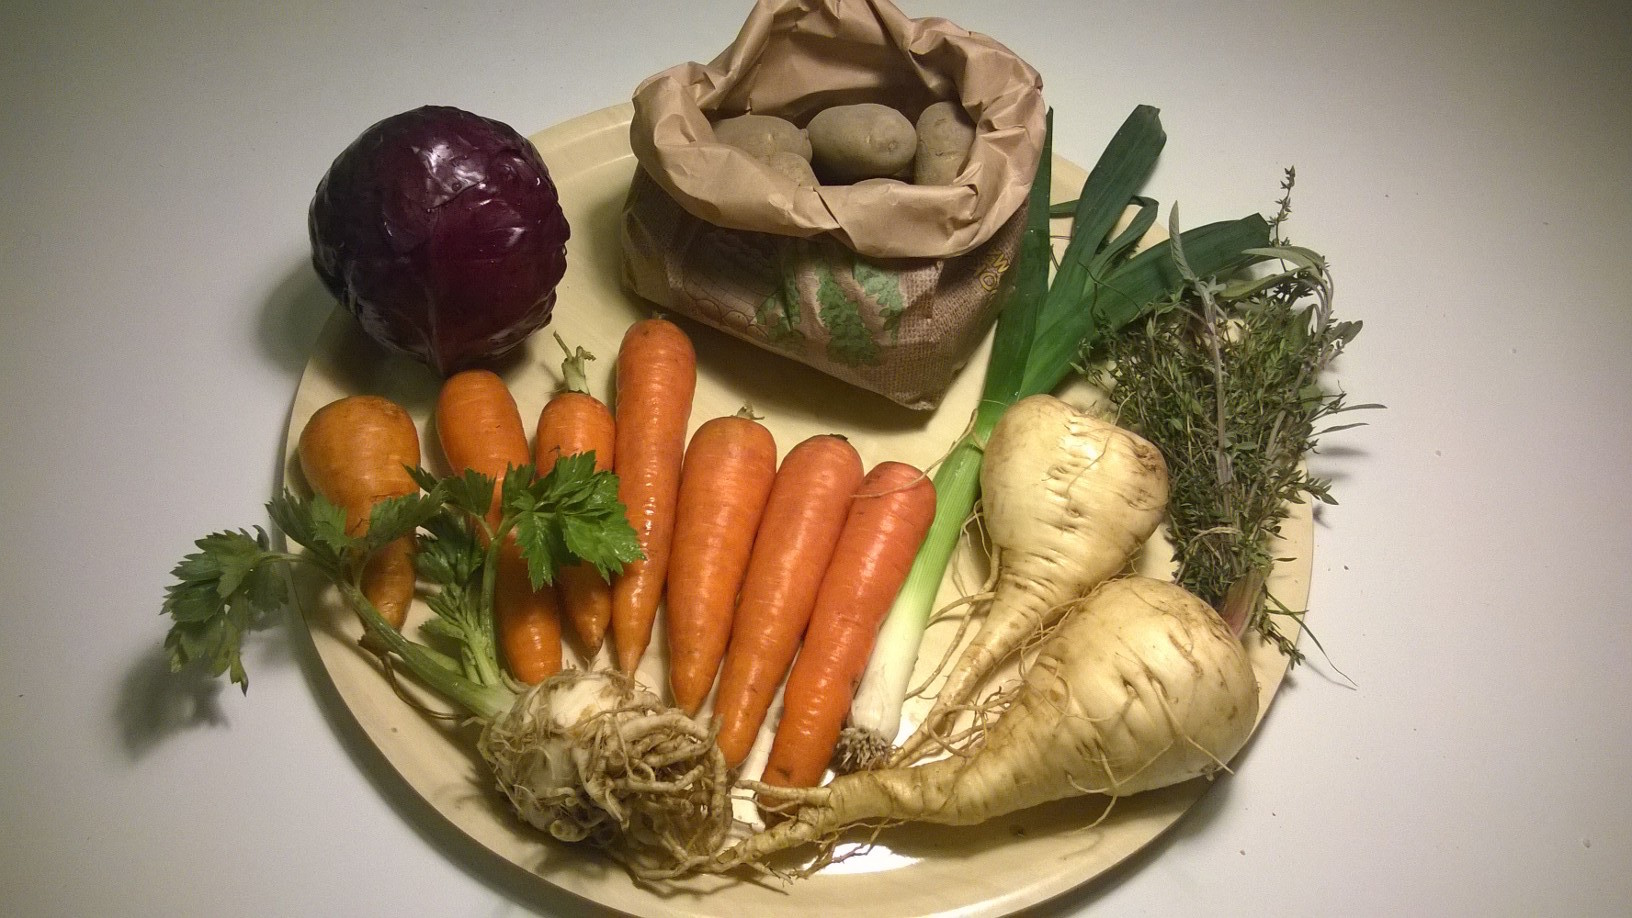 punakaali 580g, porkkana 663g, selleri 125g, peruna 1011g, palsternakka 519g, purjo 67g, yrttinippu (rosmariini ja salvia) 21g